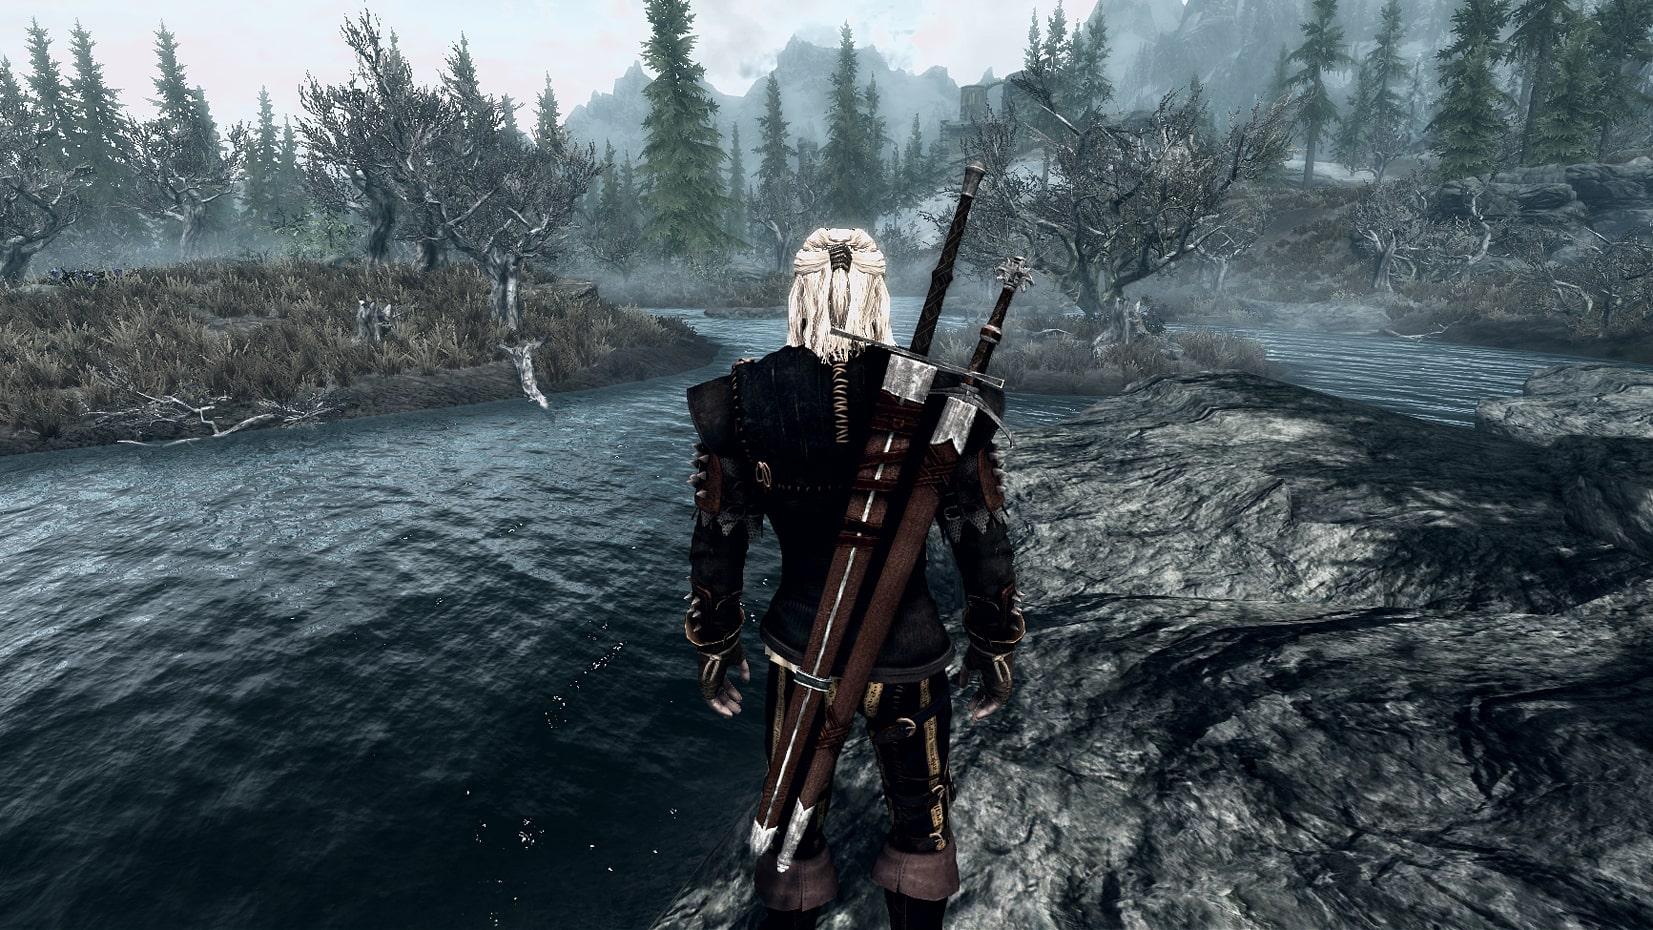 Geralt Light Armor and Witcher Swords | Легкая броня и меч Геральта